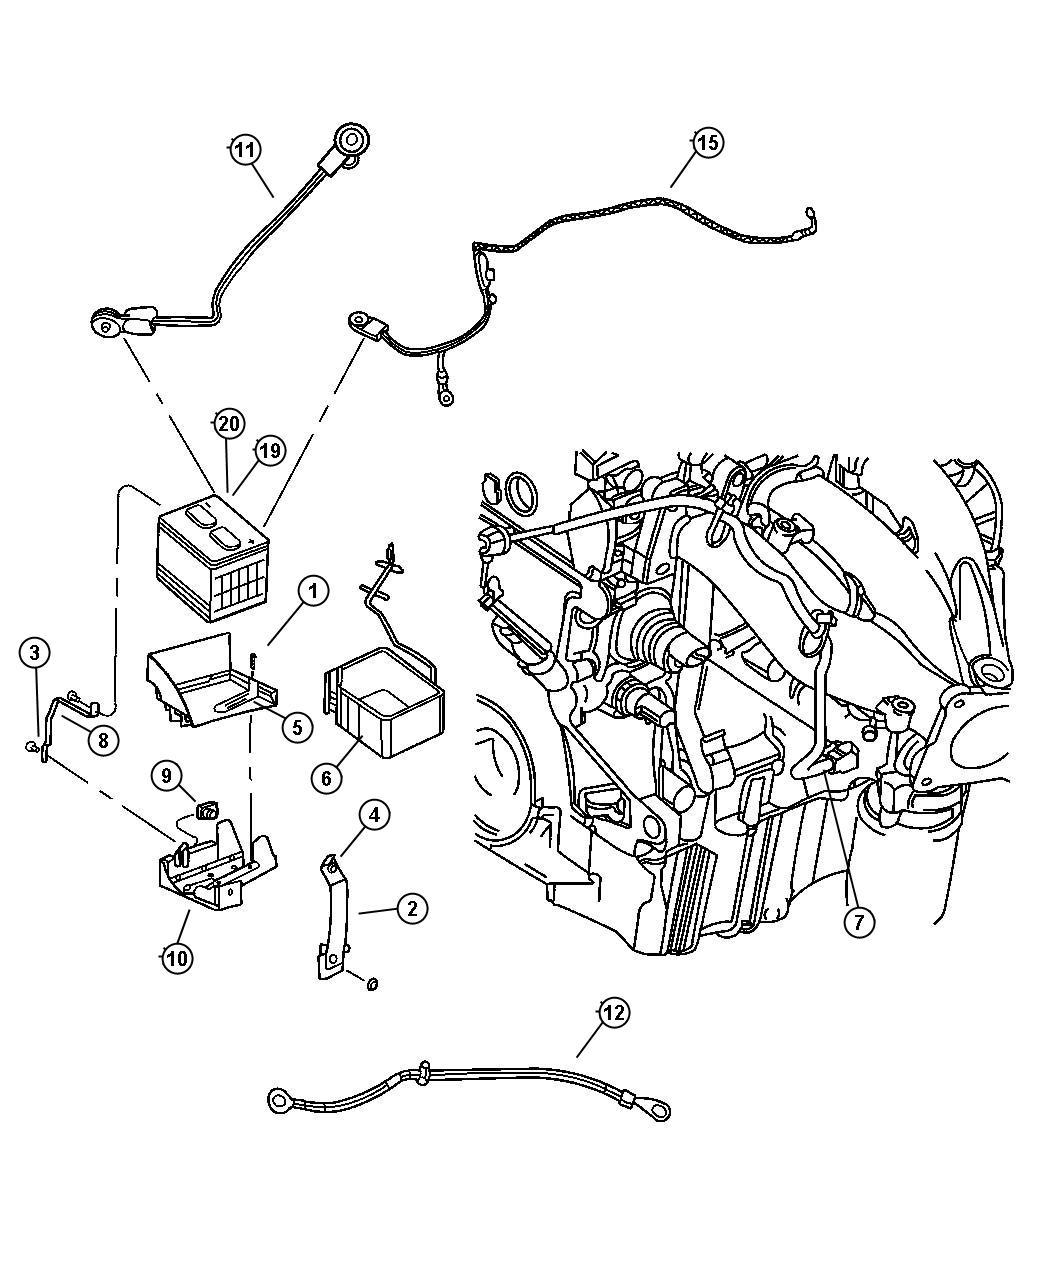 Chrysler Sebring Nut M10x1 50 Battery Ground Negative